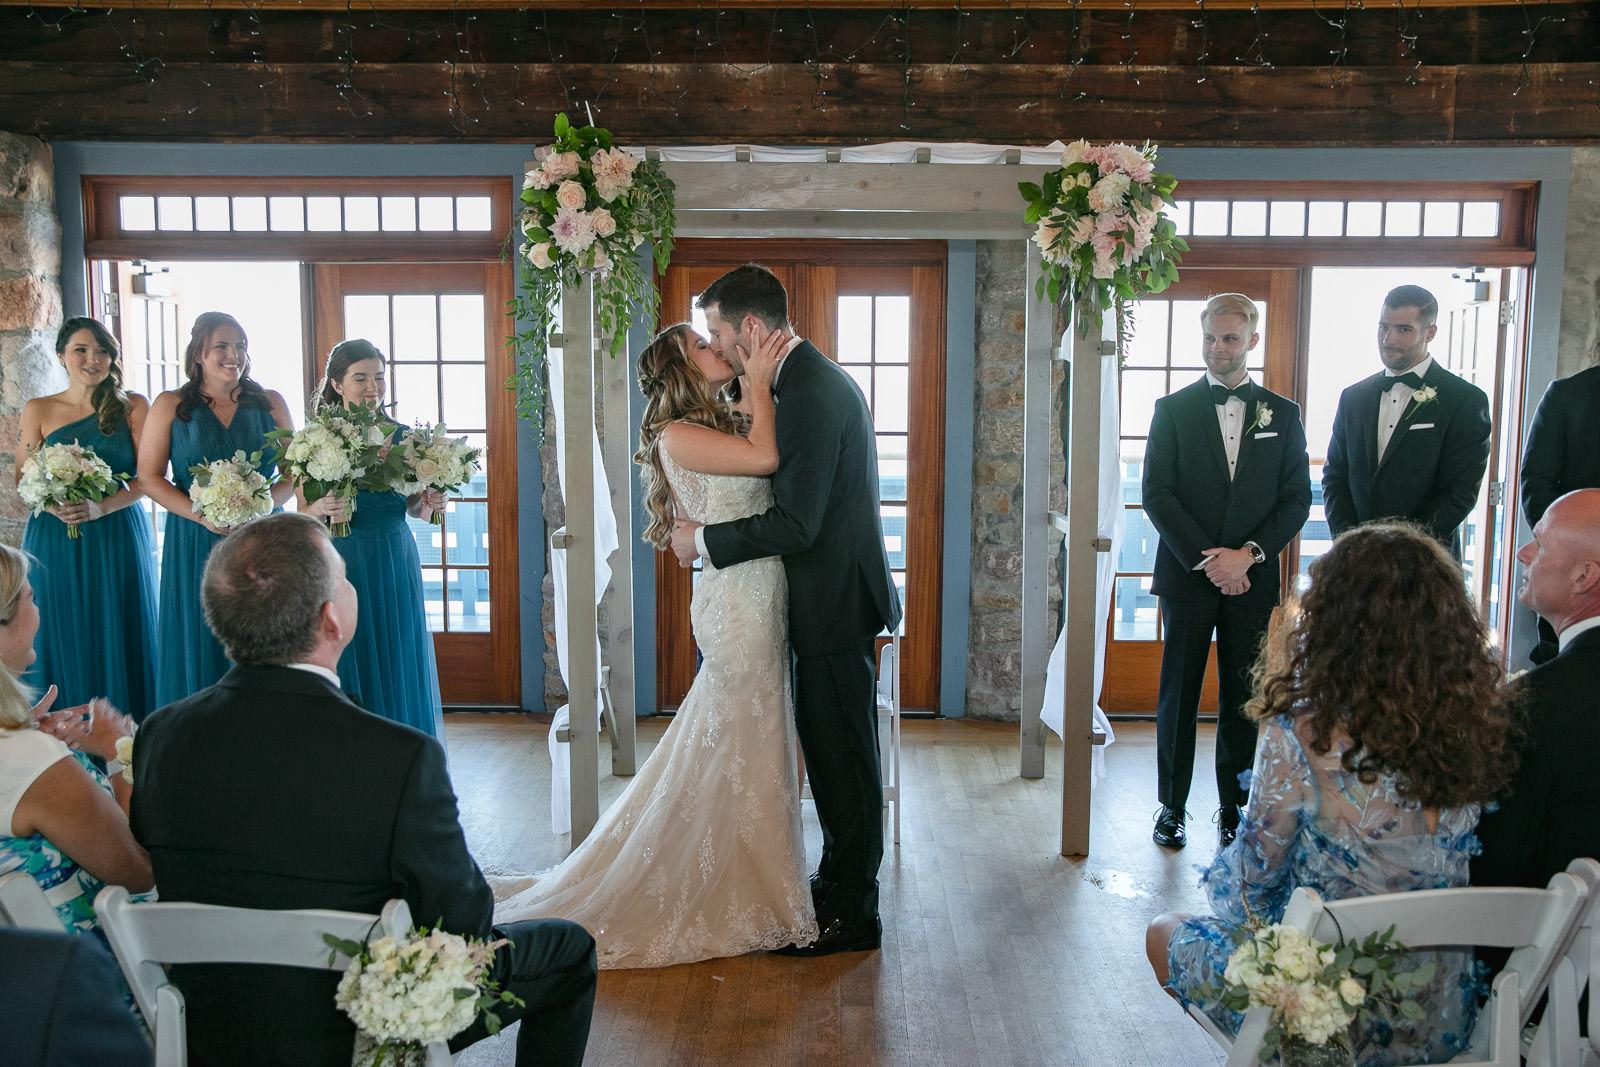 Wedding, Narragansett Towers, The Towers, Narragansett, Rhode Island, RI, Tracy Jenkins photography, RI wedding photographer, Rhode Island wedding photographer, wedding ceremony, first kiss